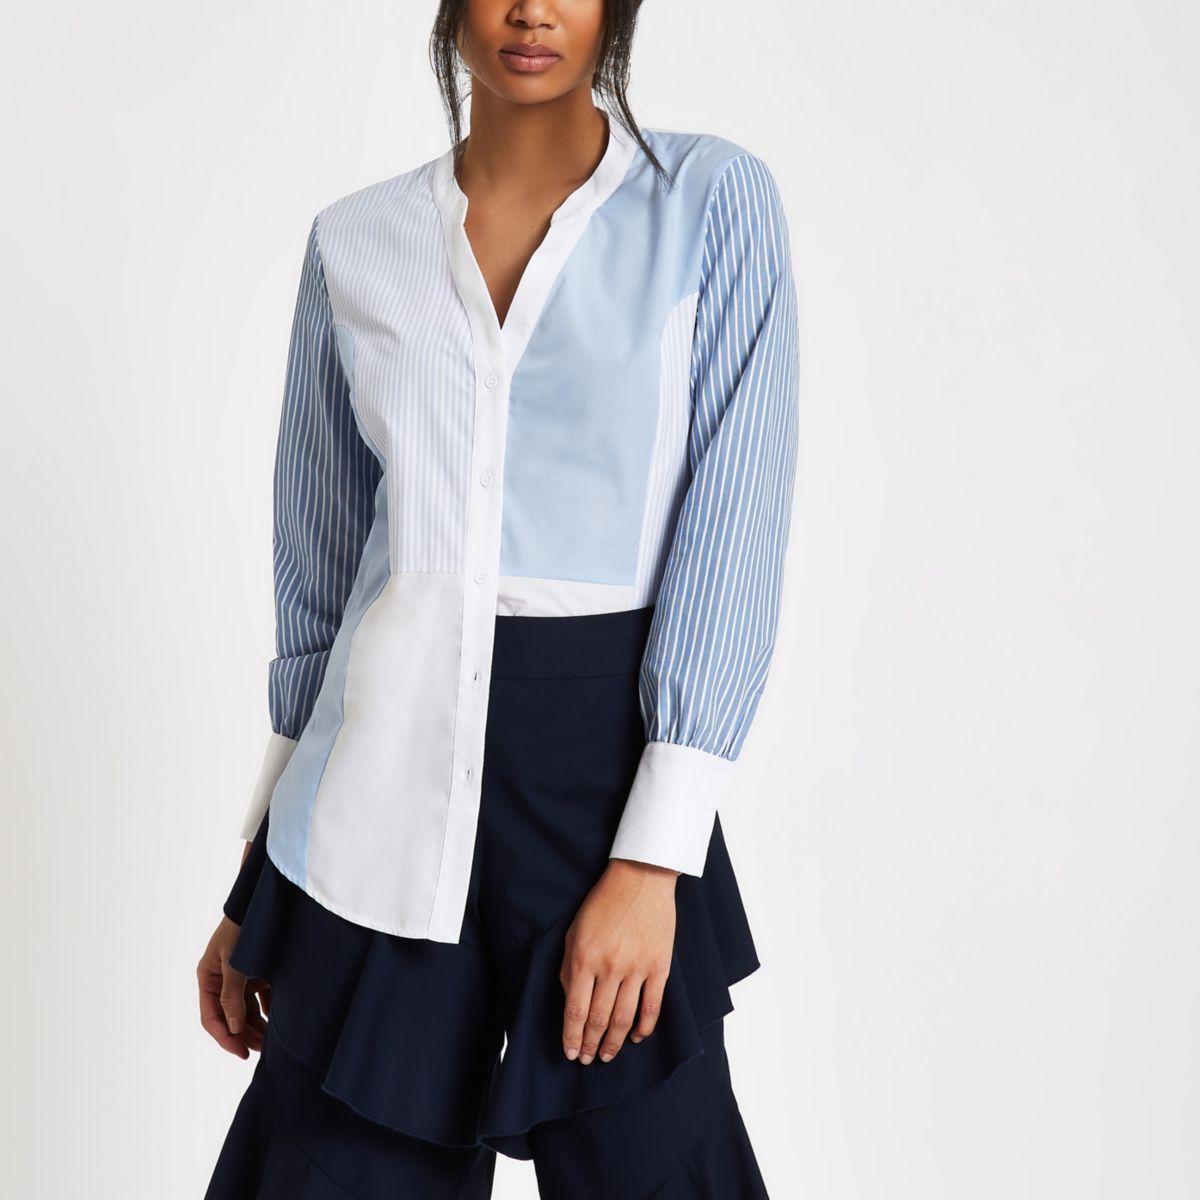 Blue Mix Stripe Long Sleeve Shirt                                  Blue Mix Stripe Long Sleeve Shirt by River Island